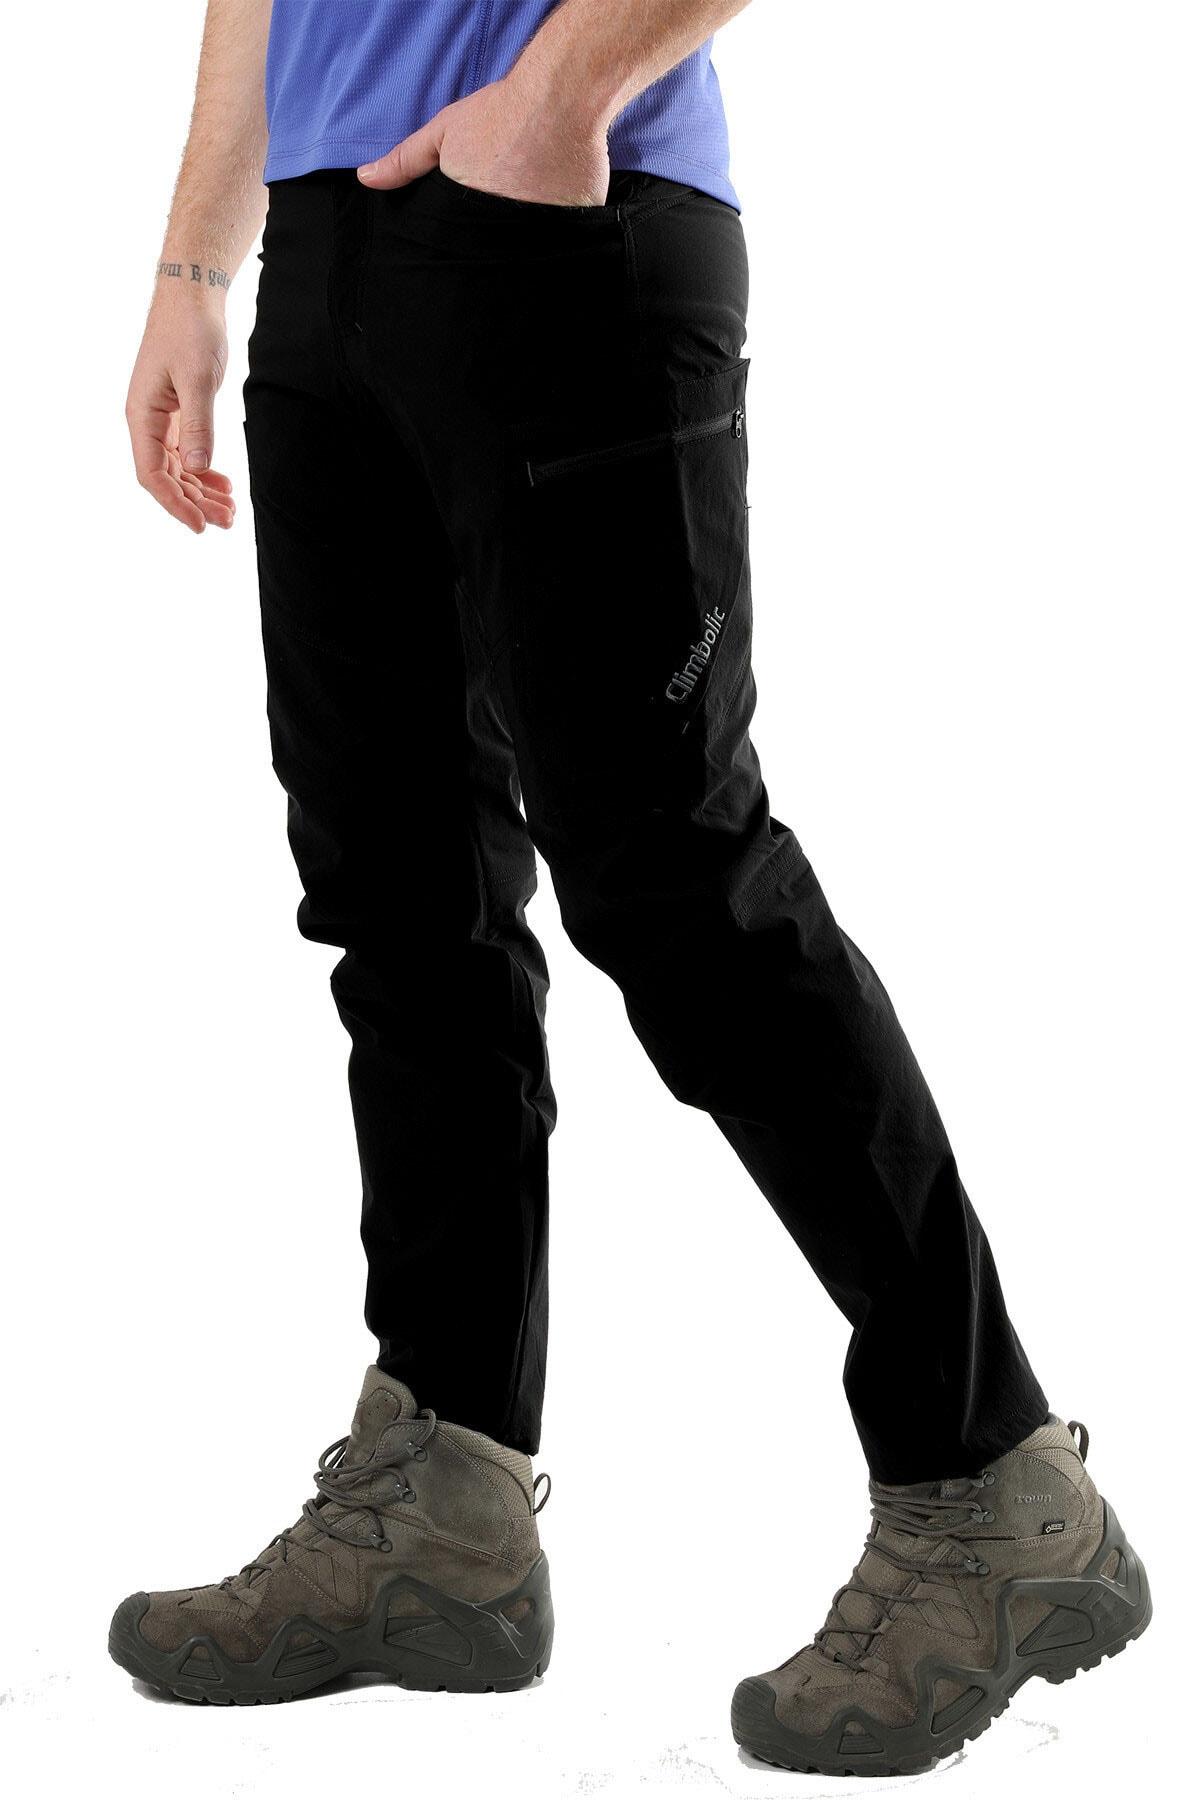 Climbolic Discovery Outdoor Pantolon Siyah 2